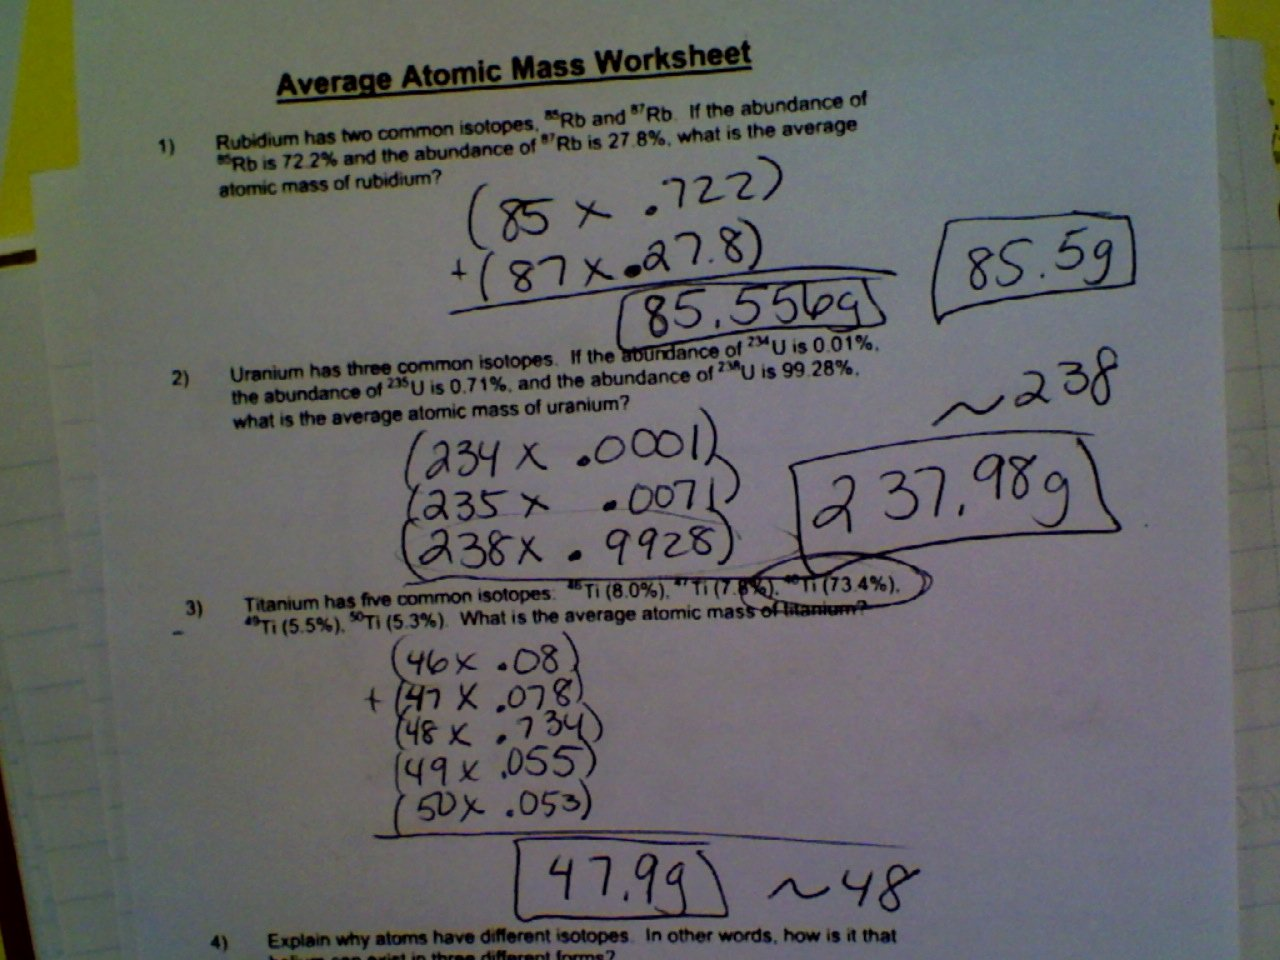 Average atomic Mass Worksheet Answers New 55 Calculating Average atomic Mass Worksheet Calculating